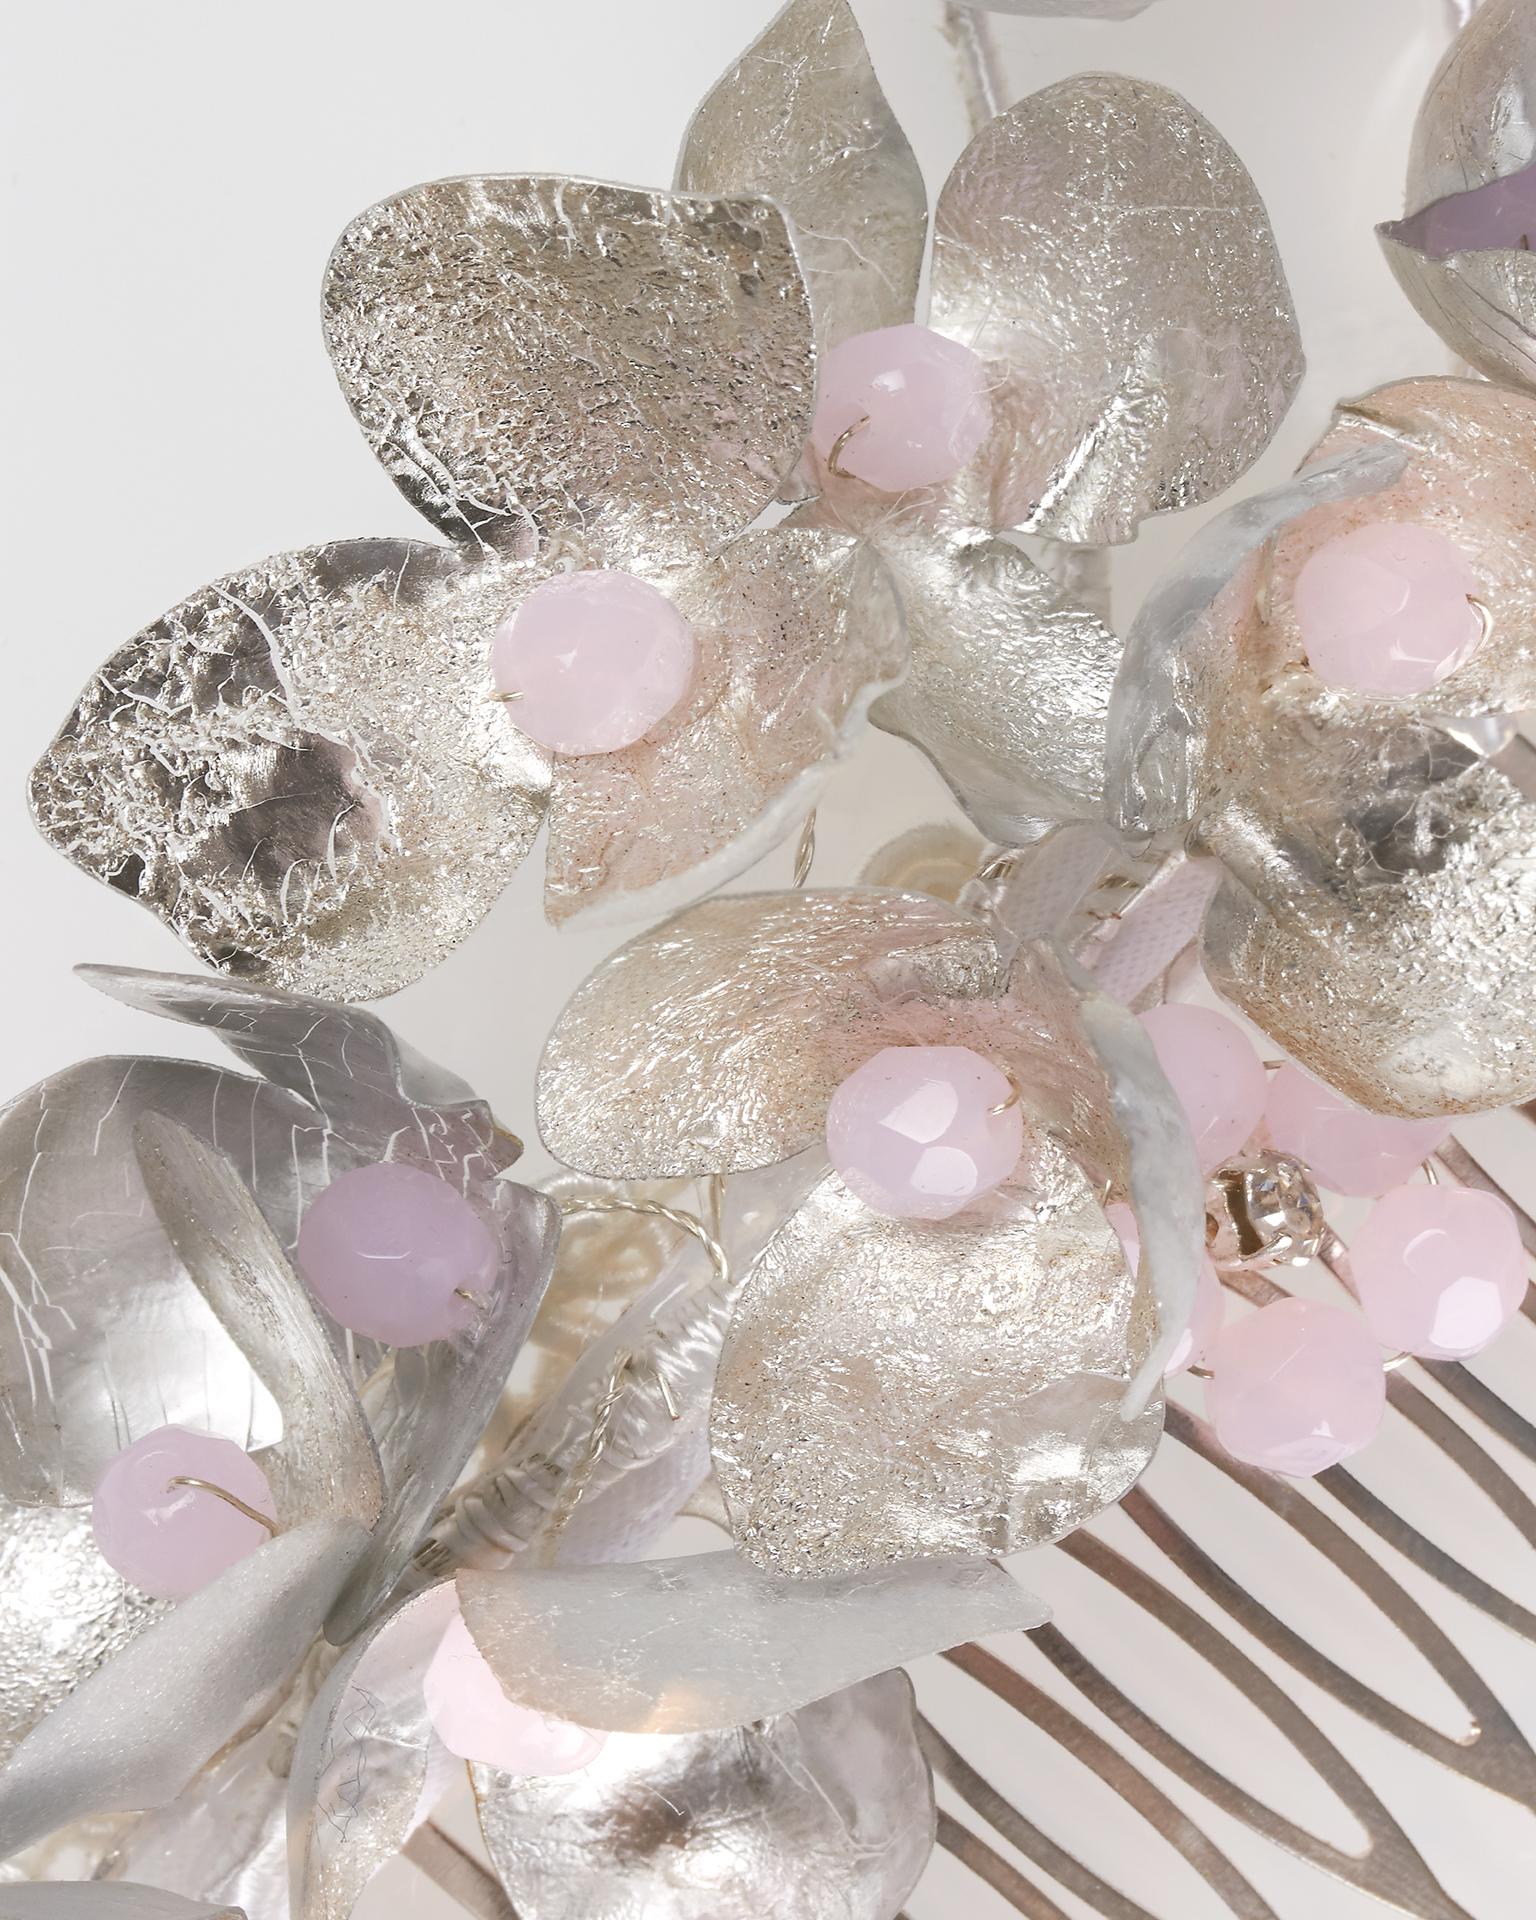 Metal bridal mantilla comb, in silver/pink. 2018  Collection.